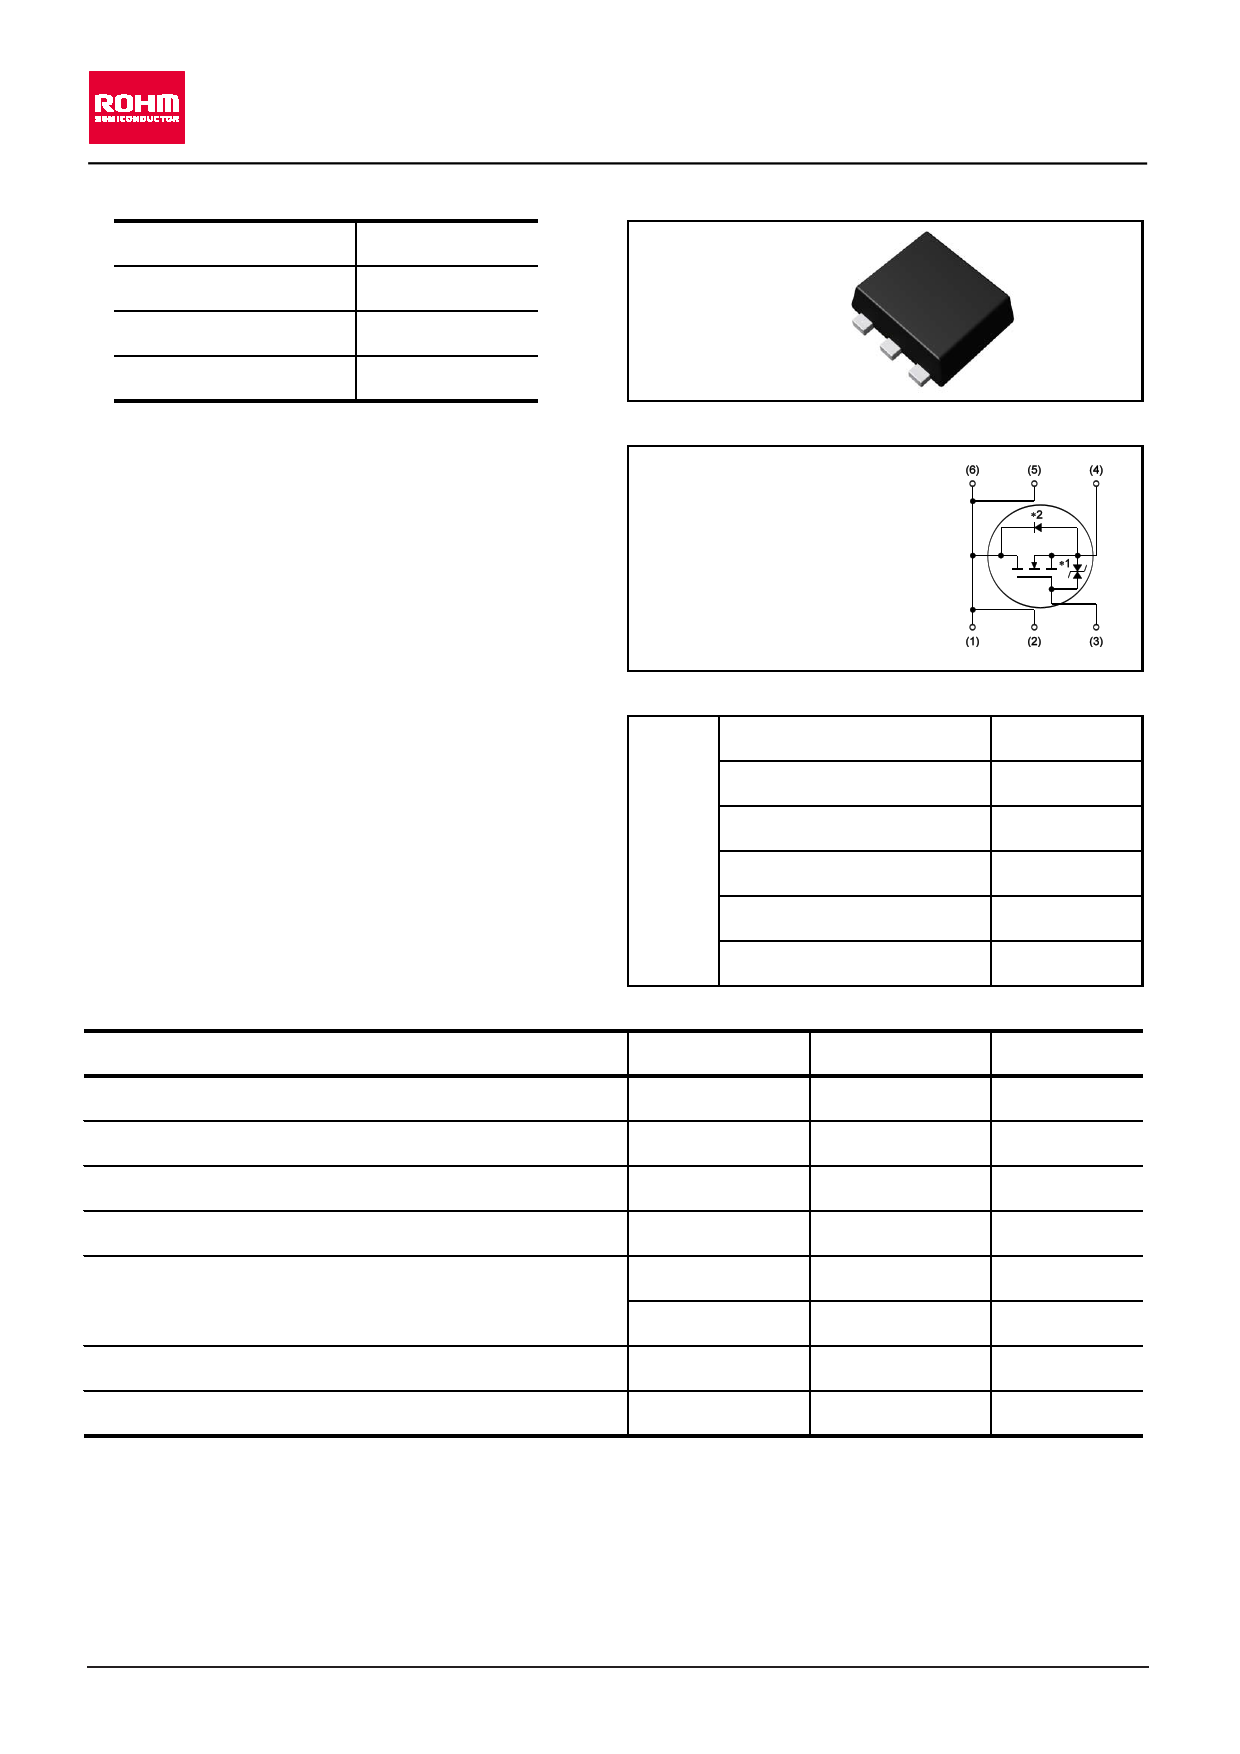 RW1C015UN Datenblatt PDF